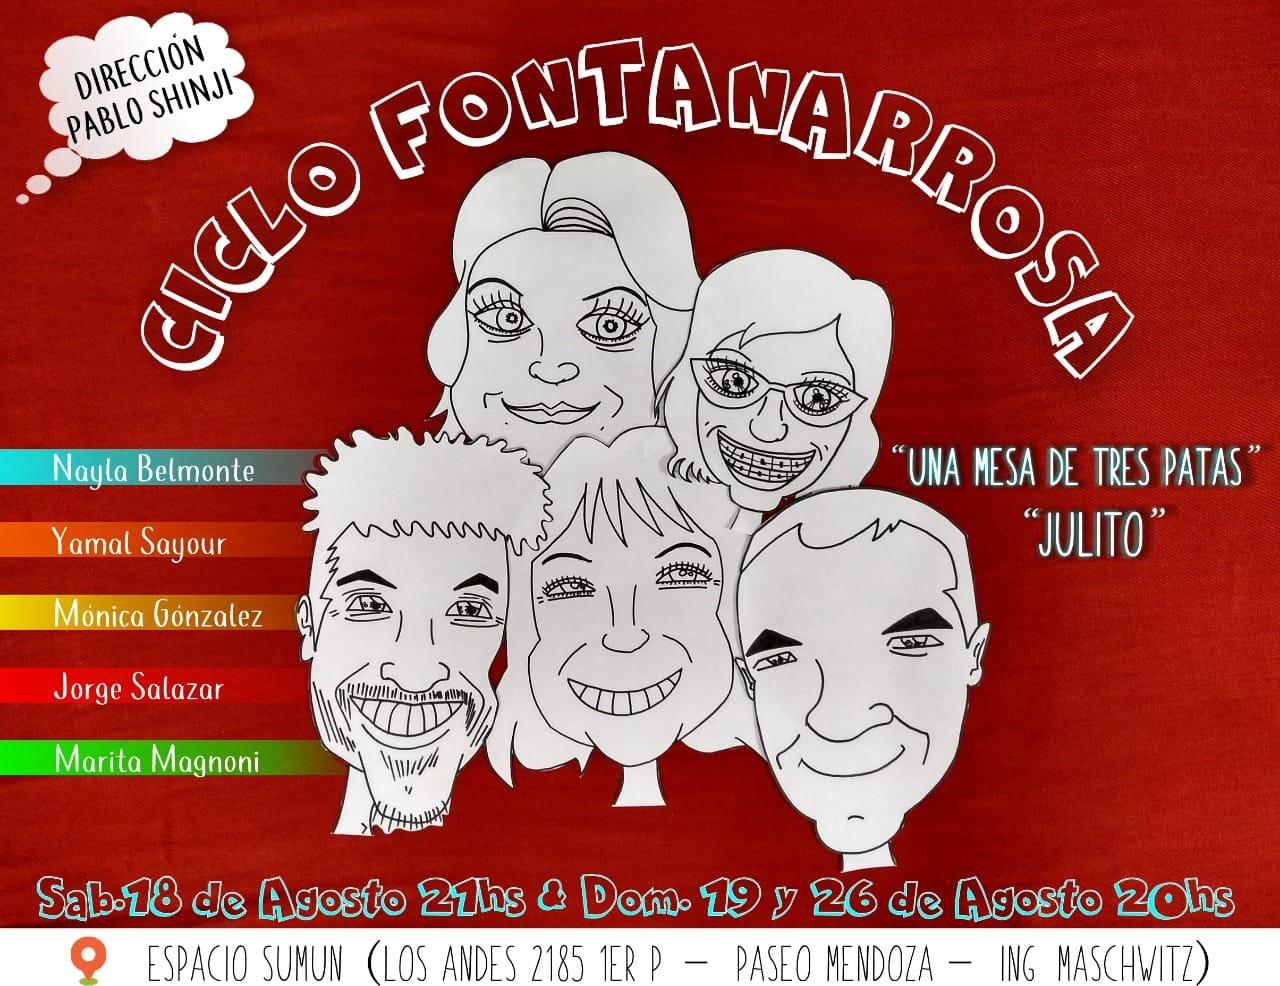 CICLO FONTANARROSA. Finalizó la 1er temporada 2018